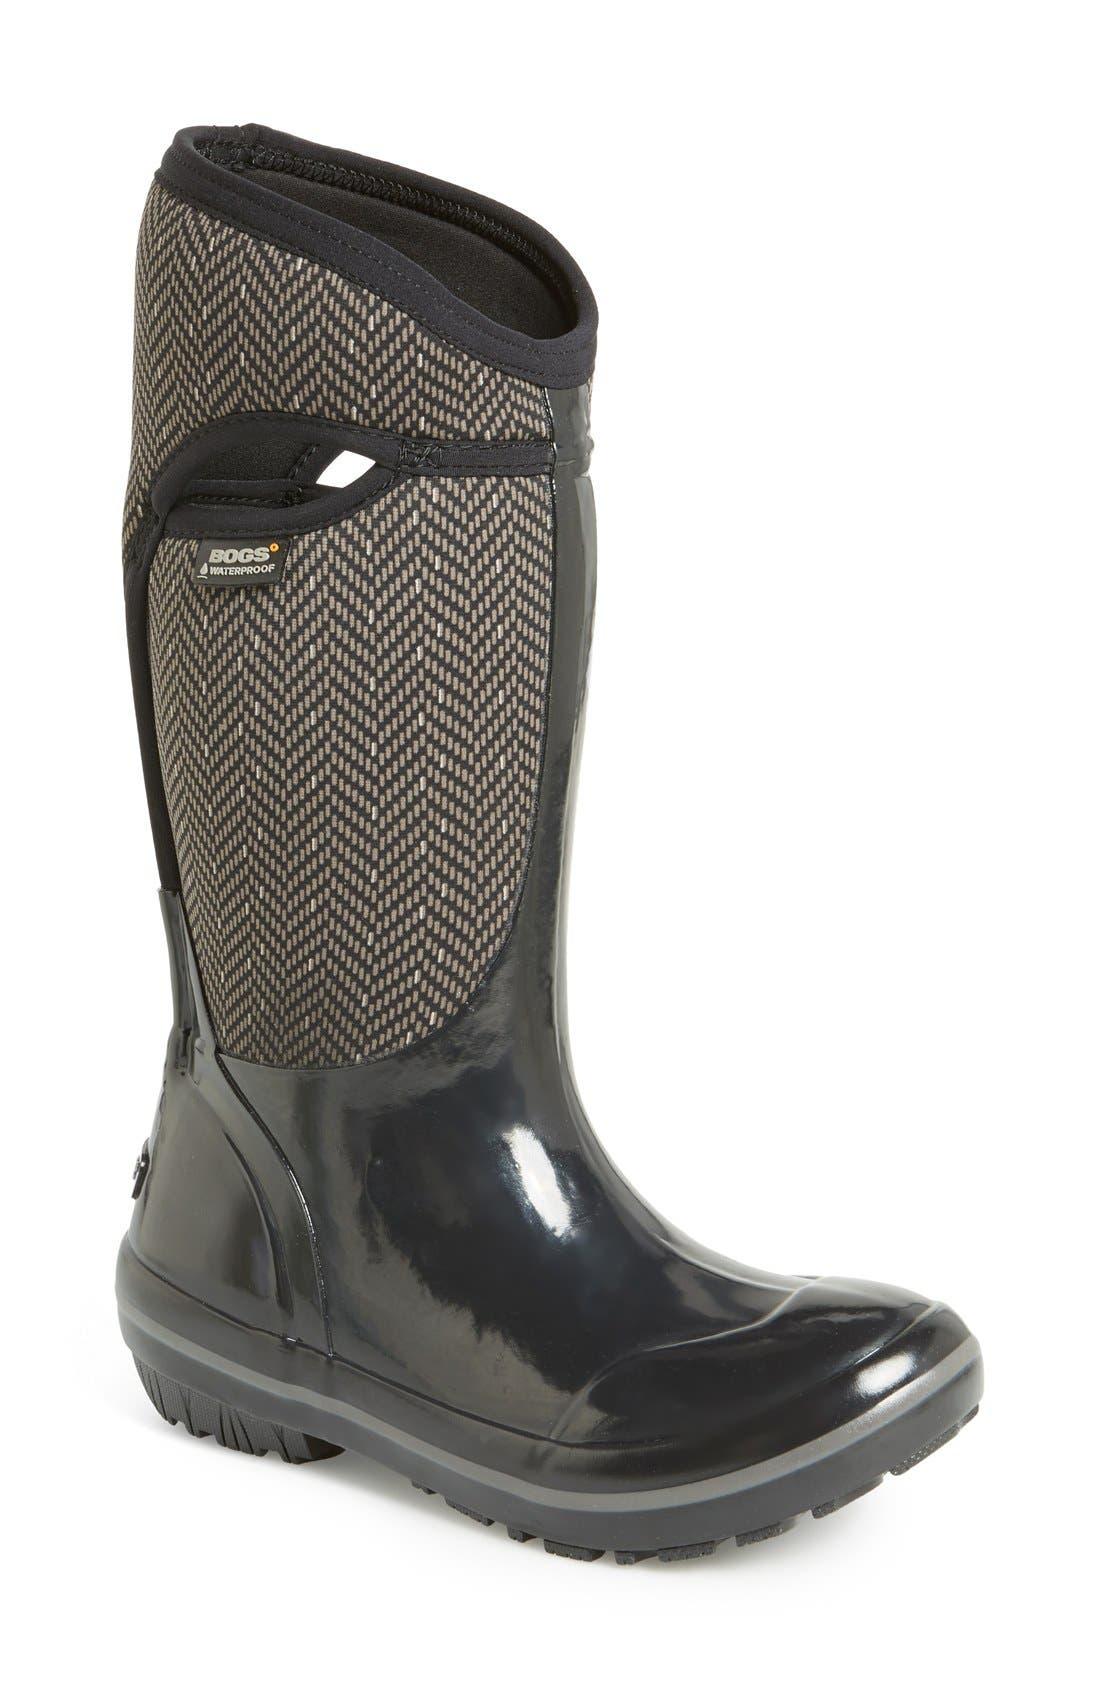 Main Image - Bogs Plimsoll  - Herringbone Waterproof Boot (Women)